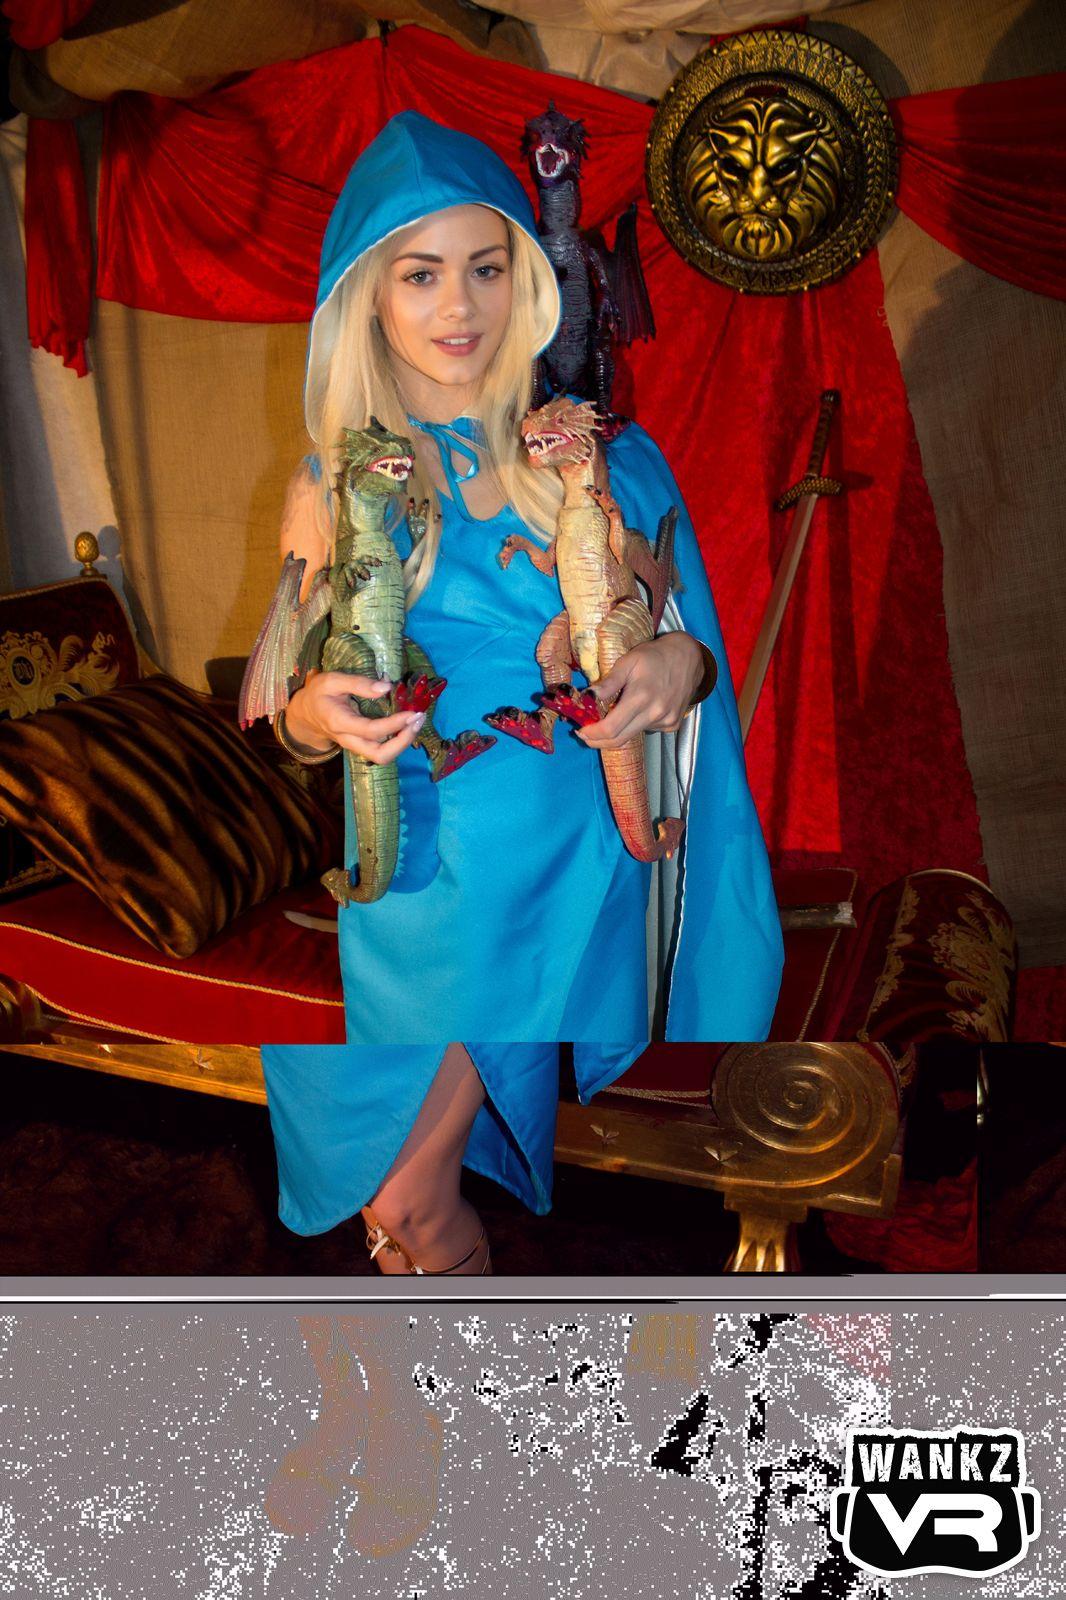 Elsa jean-game of moans